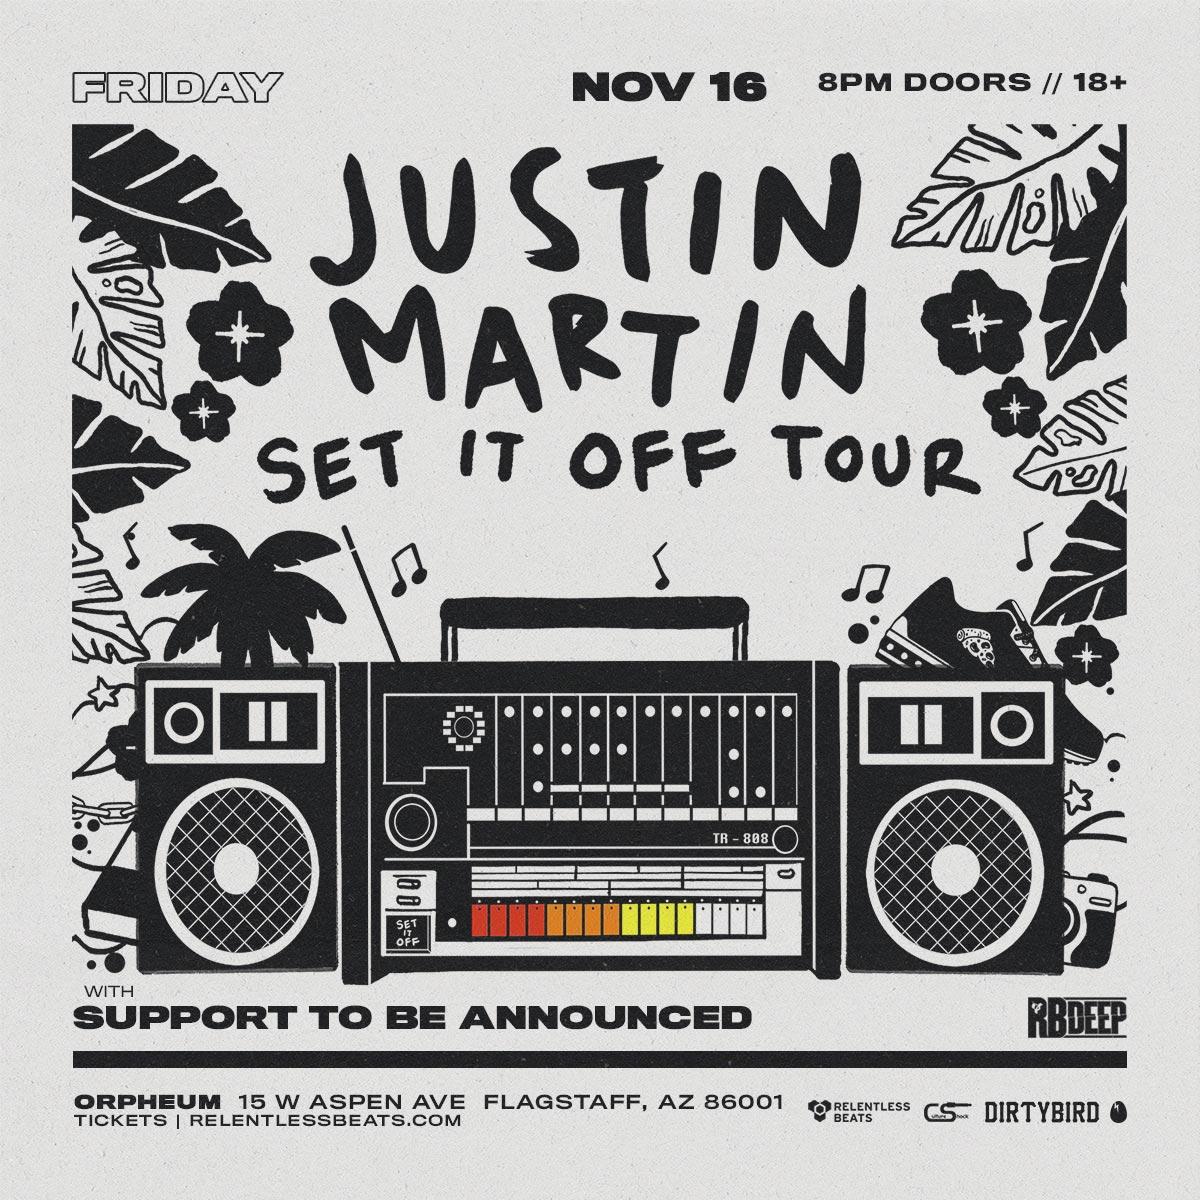 Flyer for Justin Martin